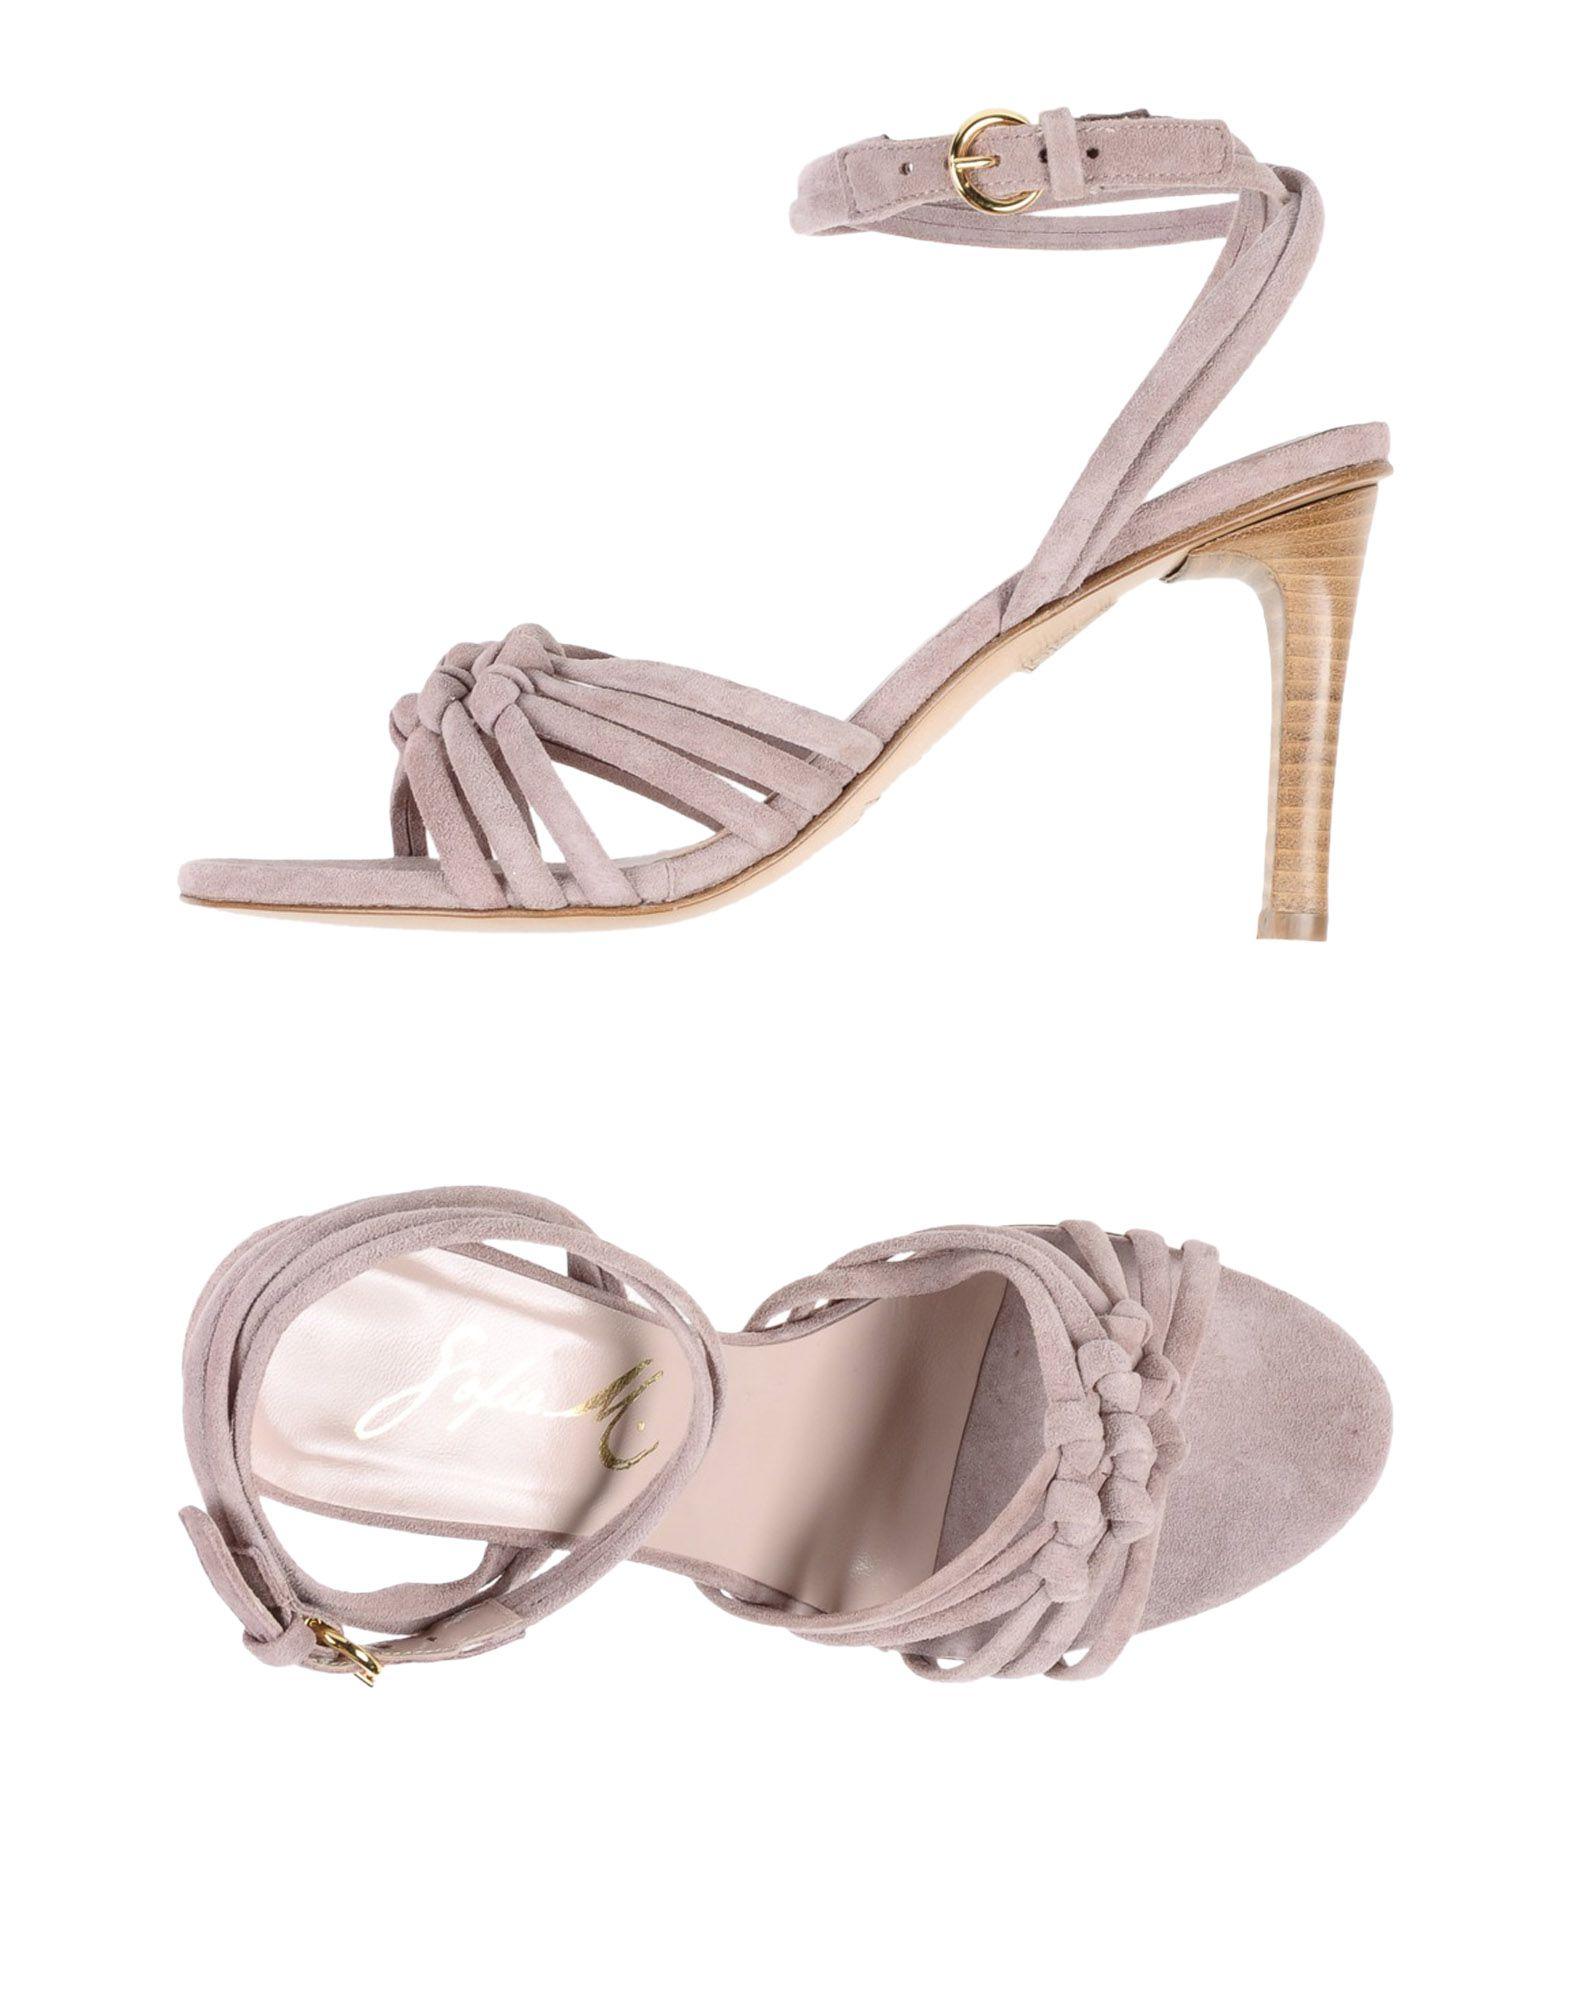 Sofia M. Sandalen Damen  11407962KS Gute Qualität beliebte Schuhe